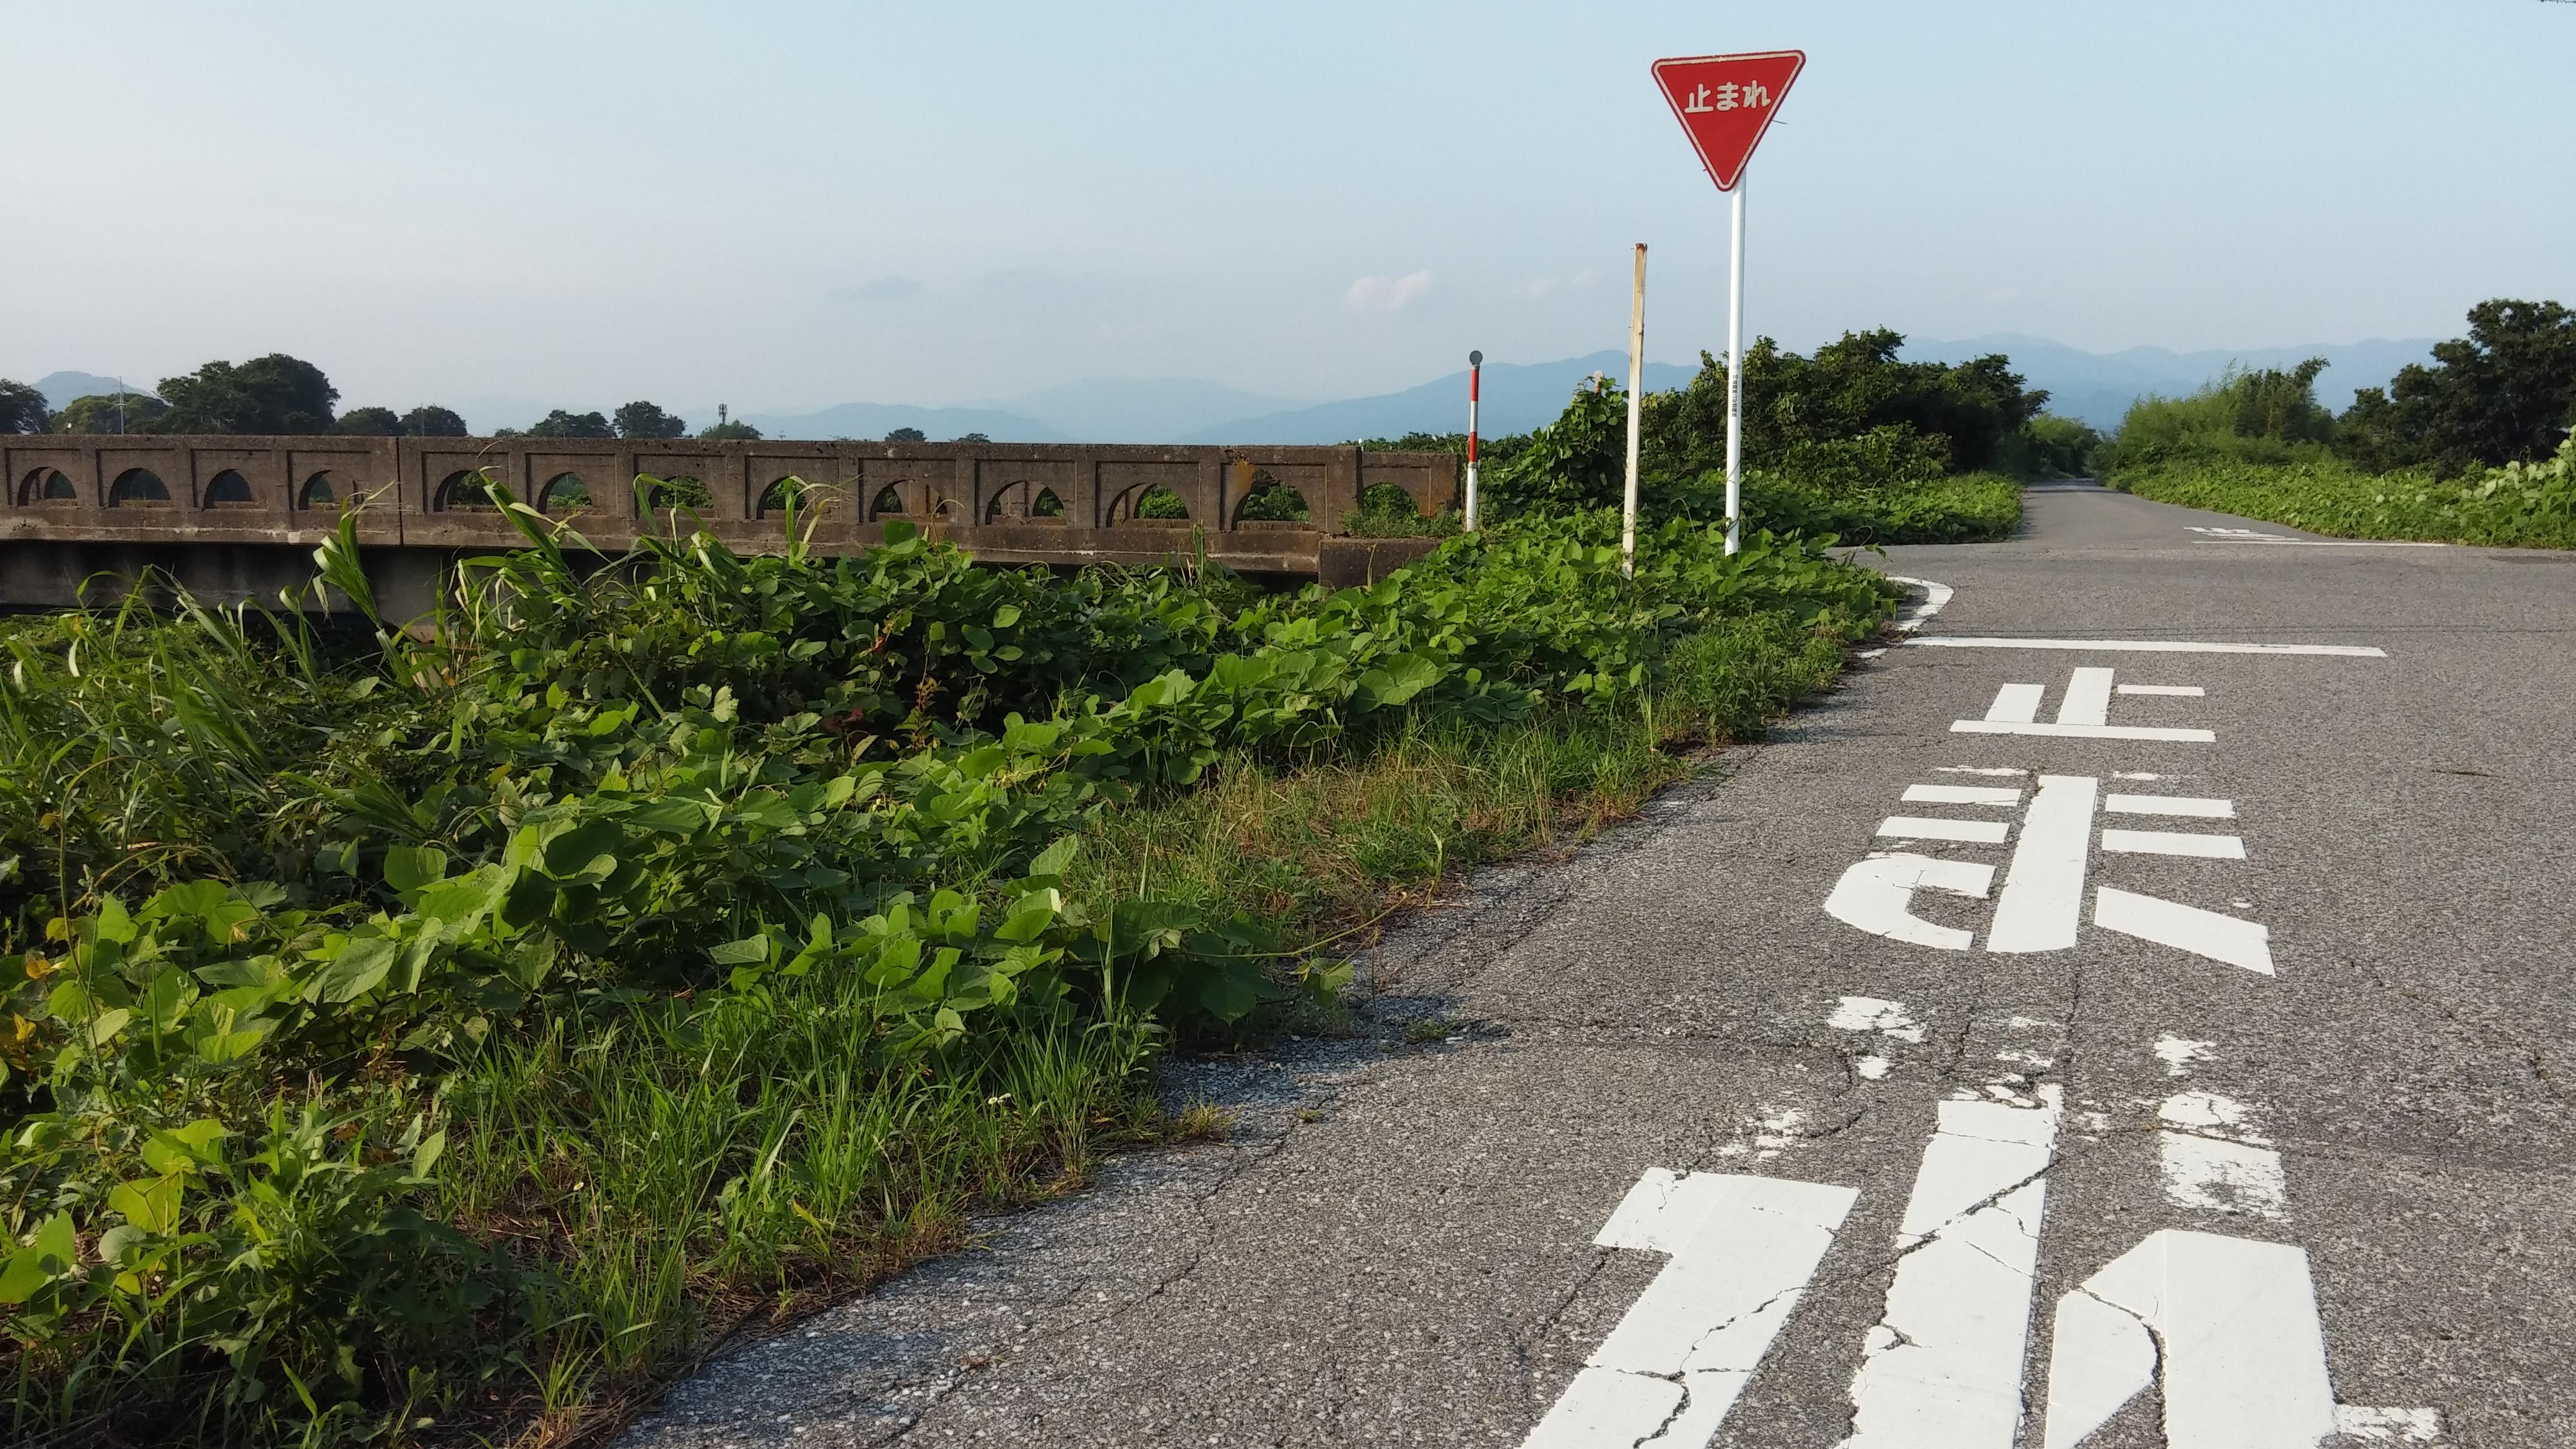 Summer in Kyoto: an Abundance of Belief in Adventure